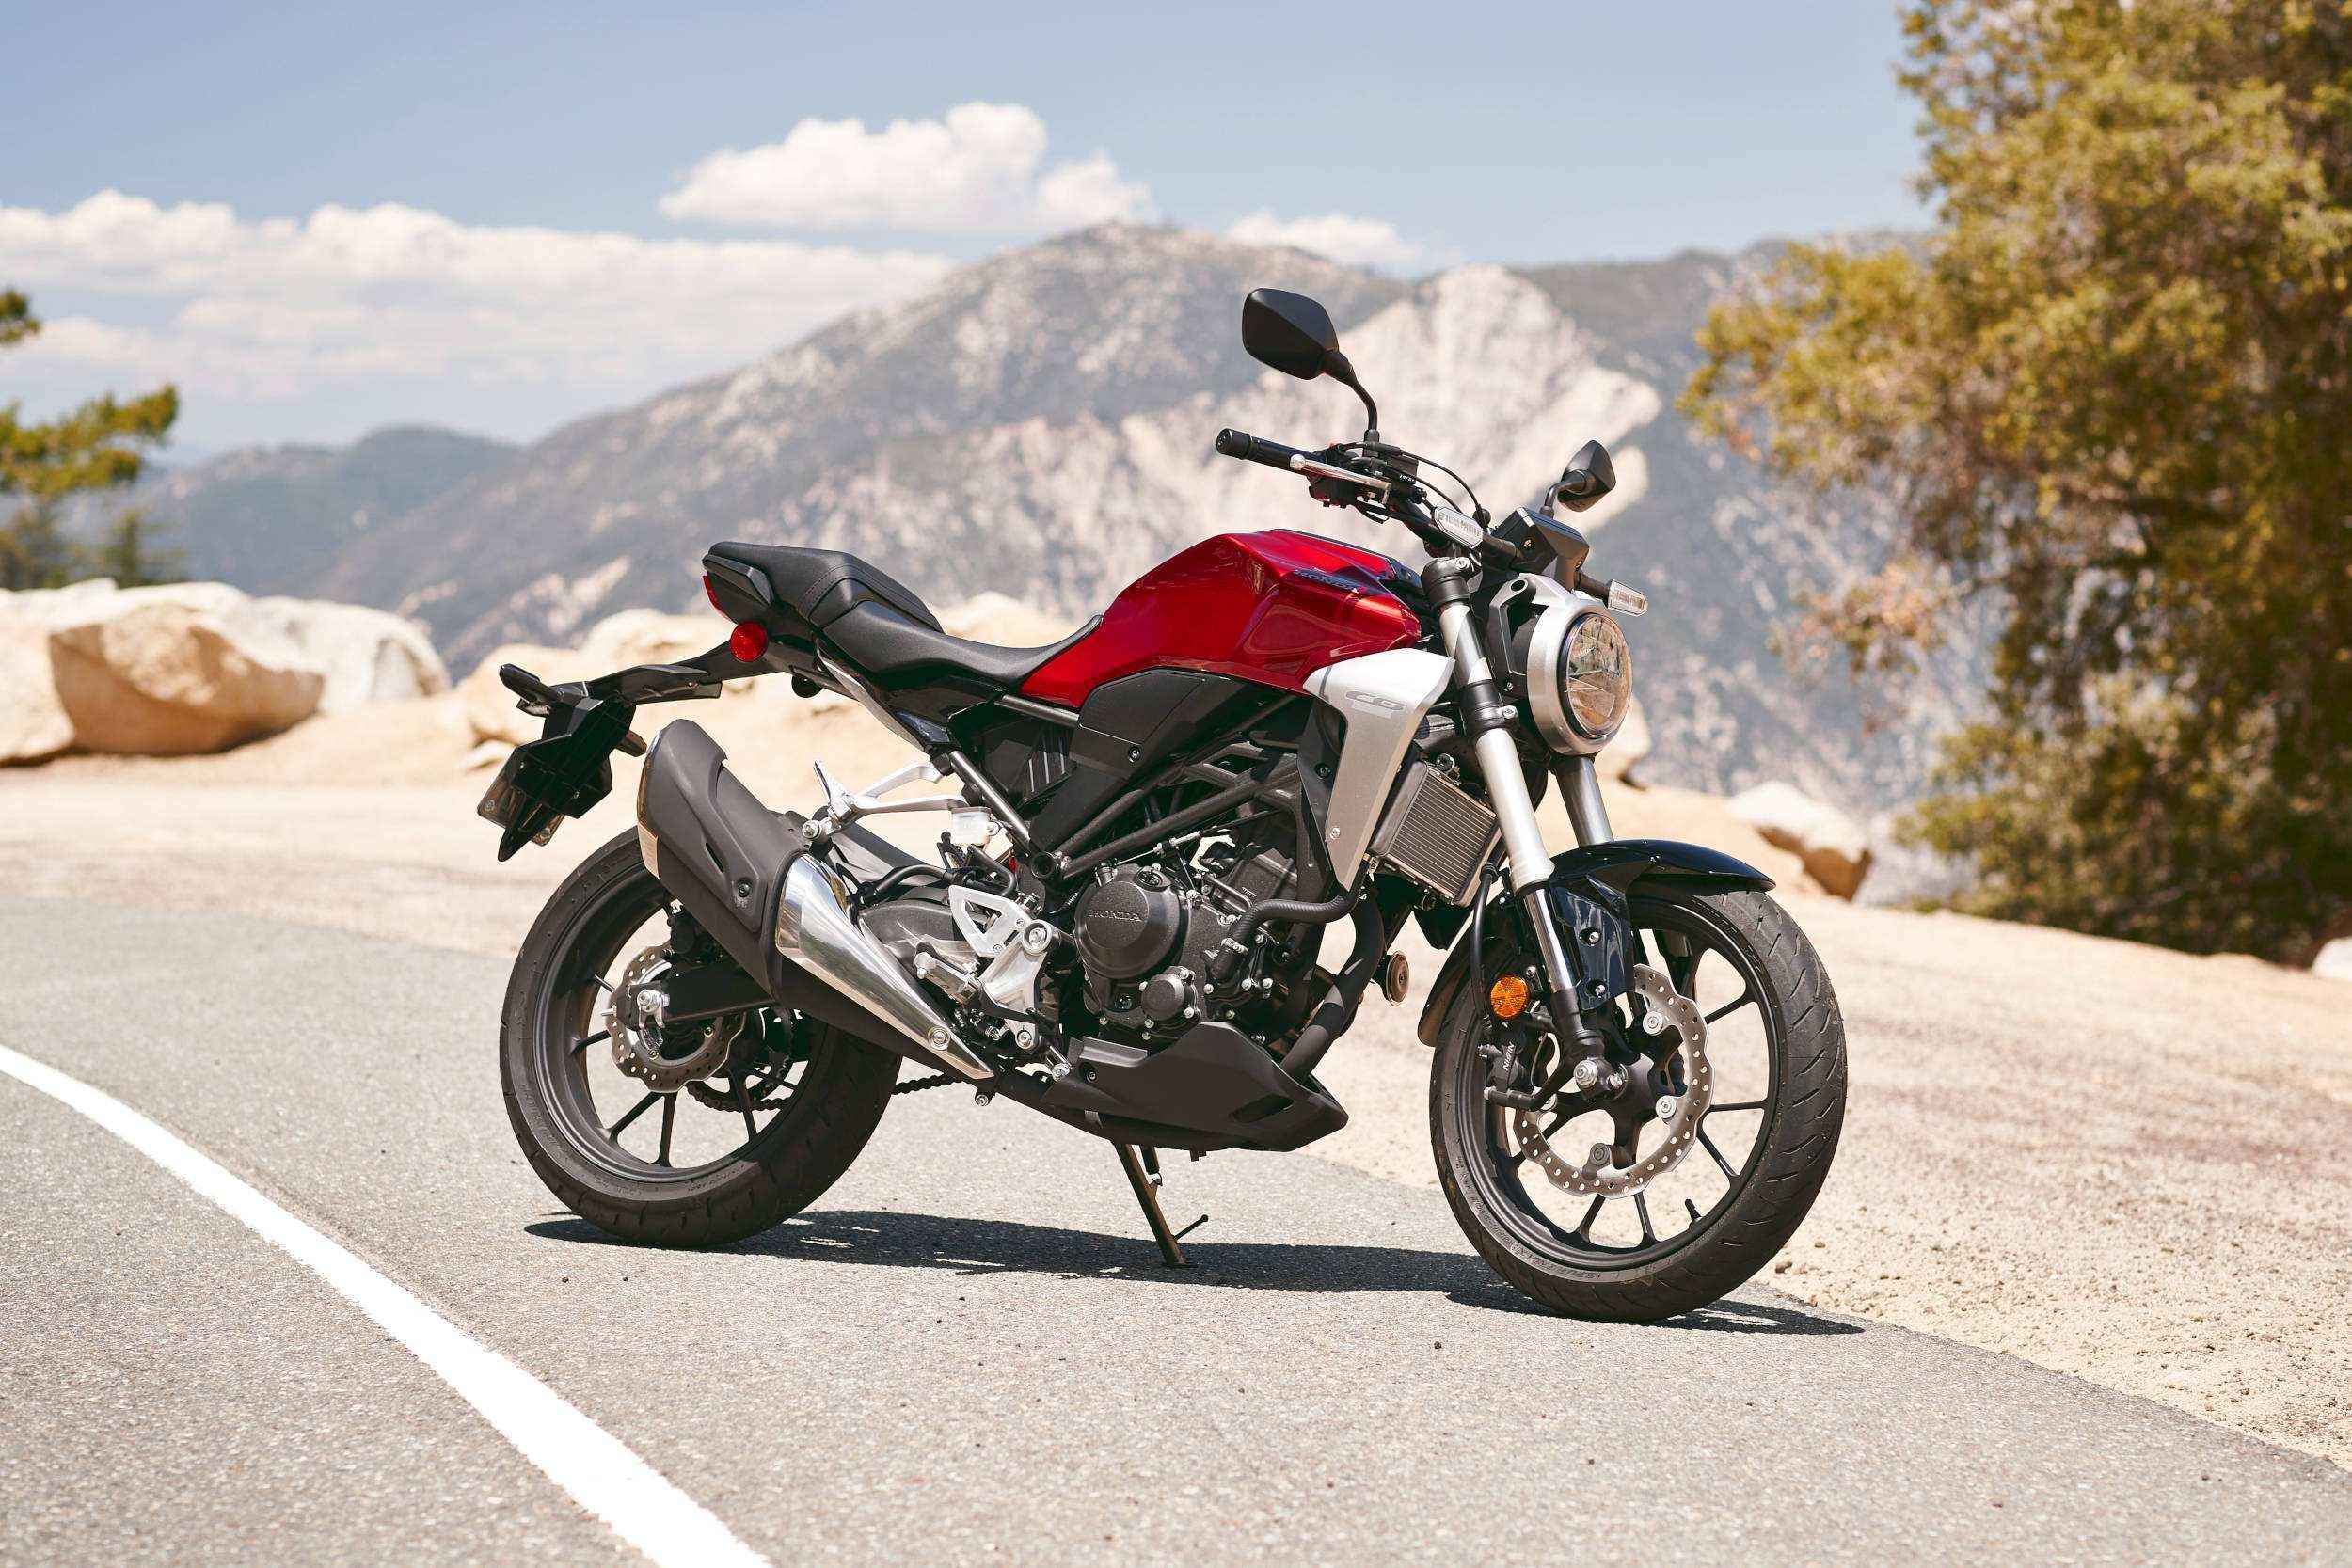 51 New 2019 Honda 300R Reviews with 2019 Honda 300R